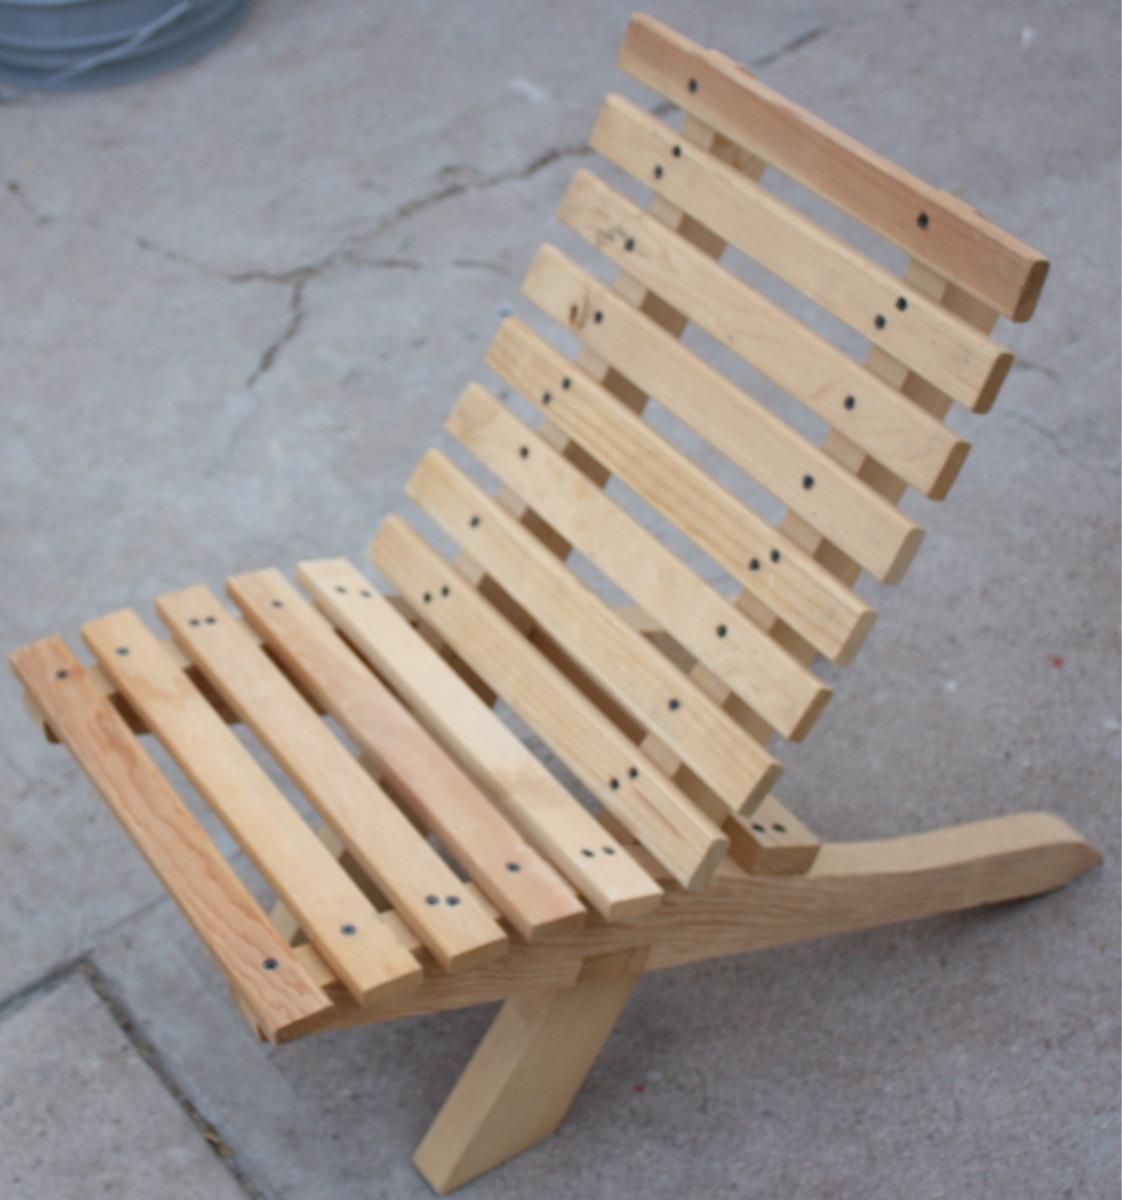 Silla para ni o mueble plegable madera jardin o interiores - Sillas baratas de madera ...